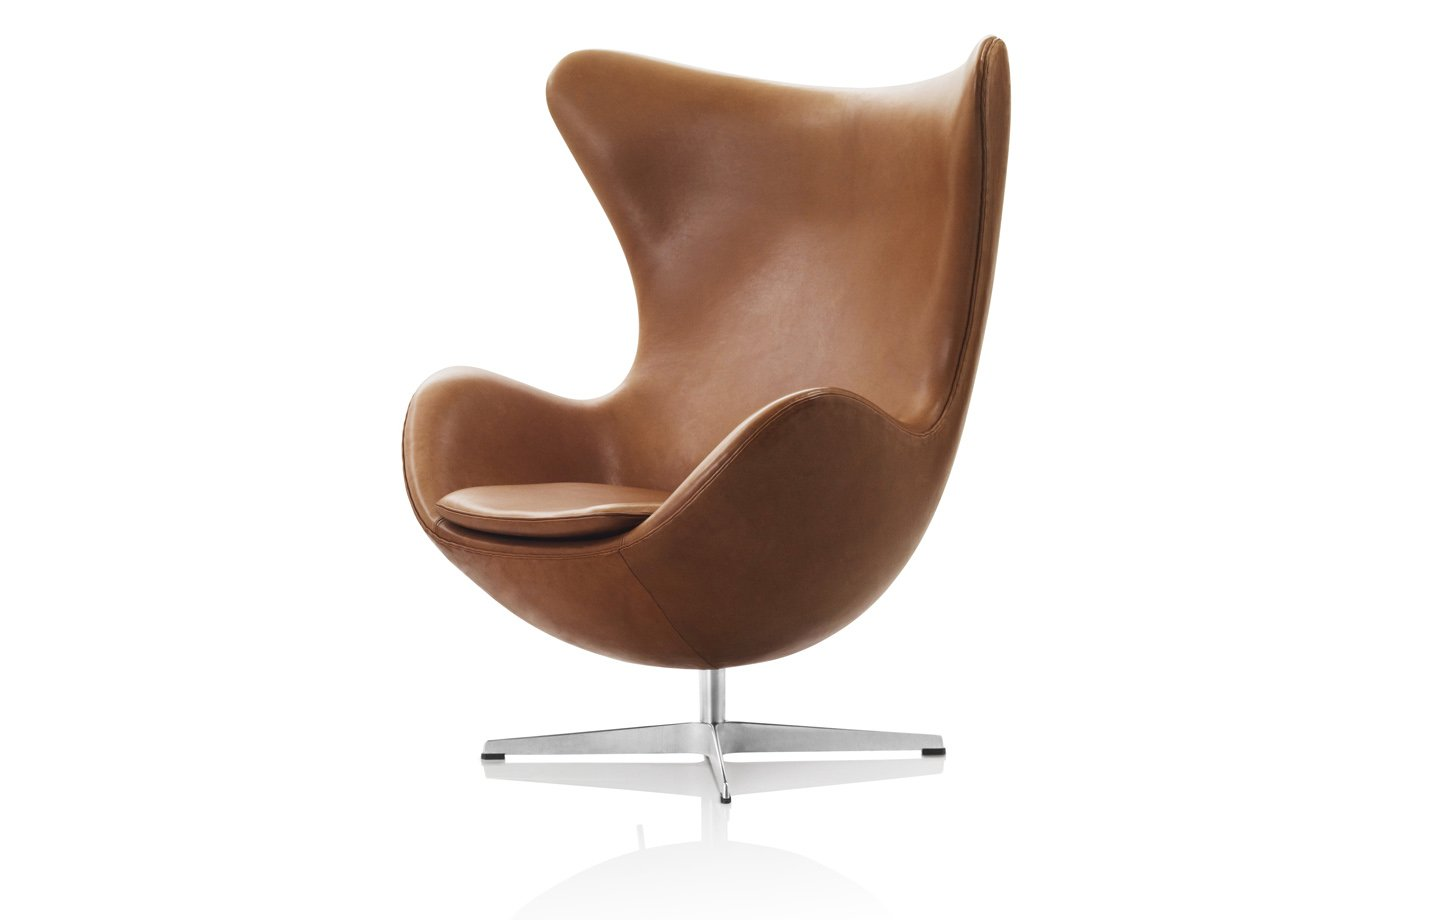 stool chair dubai first years high egg lounge fabiia uae